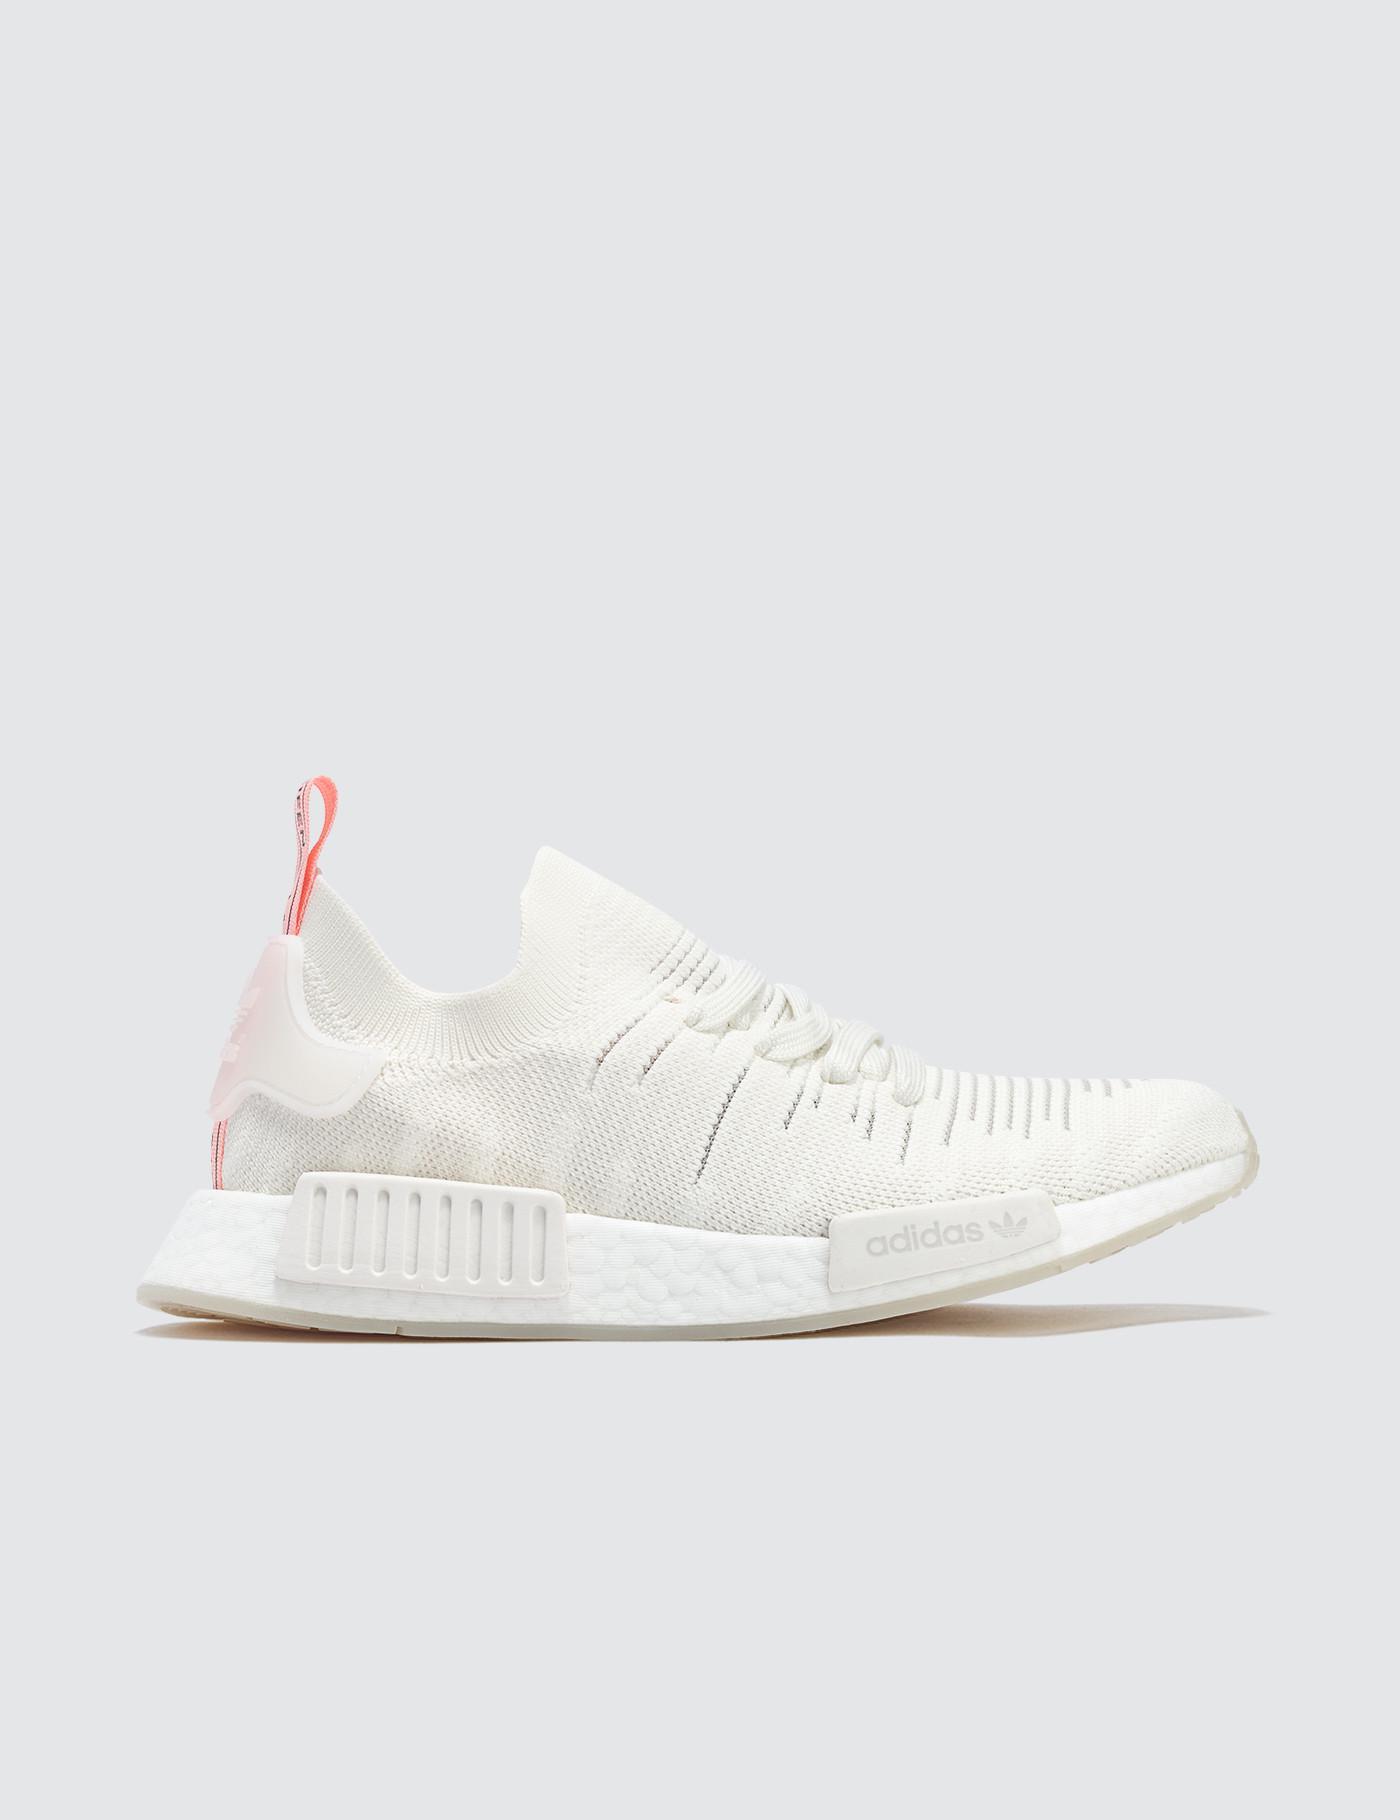 1afd4e795 Adidas Originals Nmd Cs1 Pk W in White - Lyst